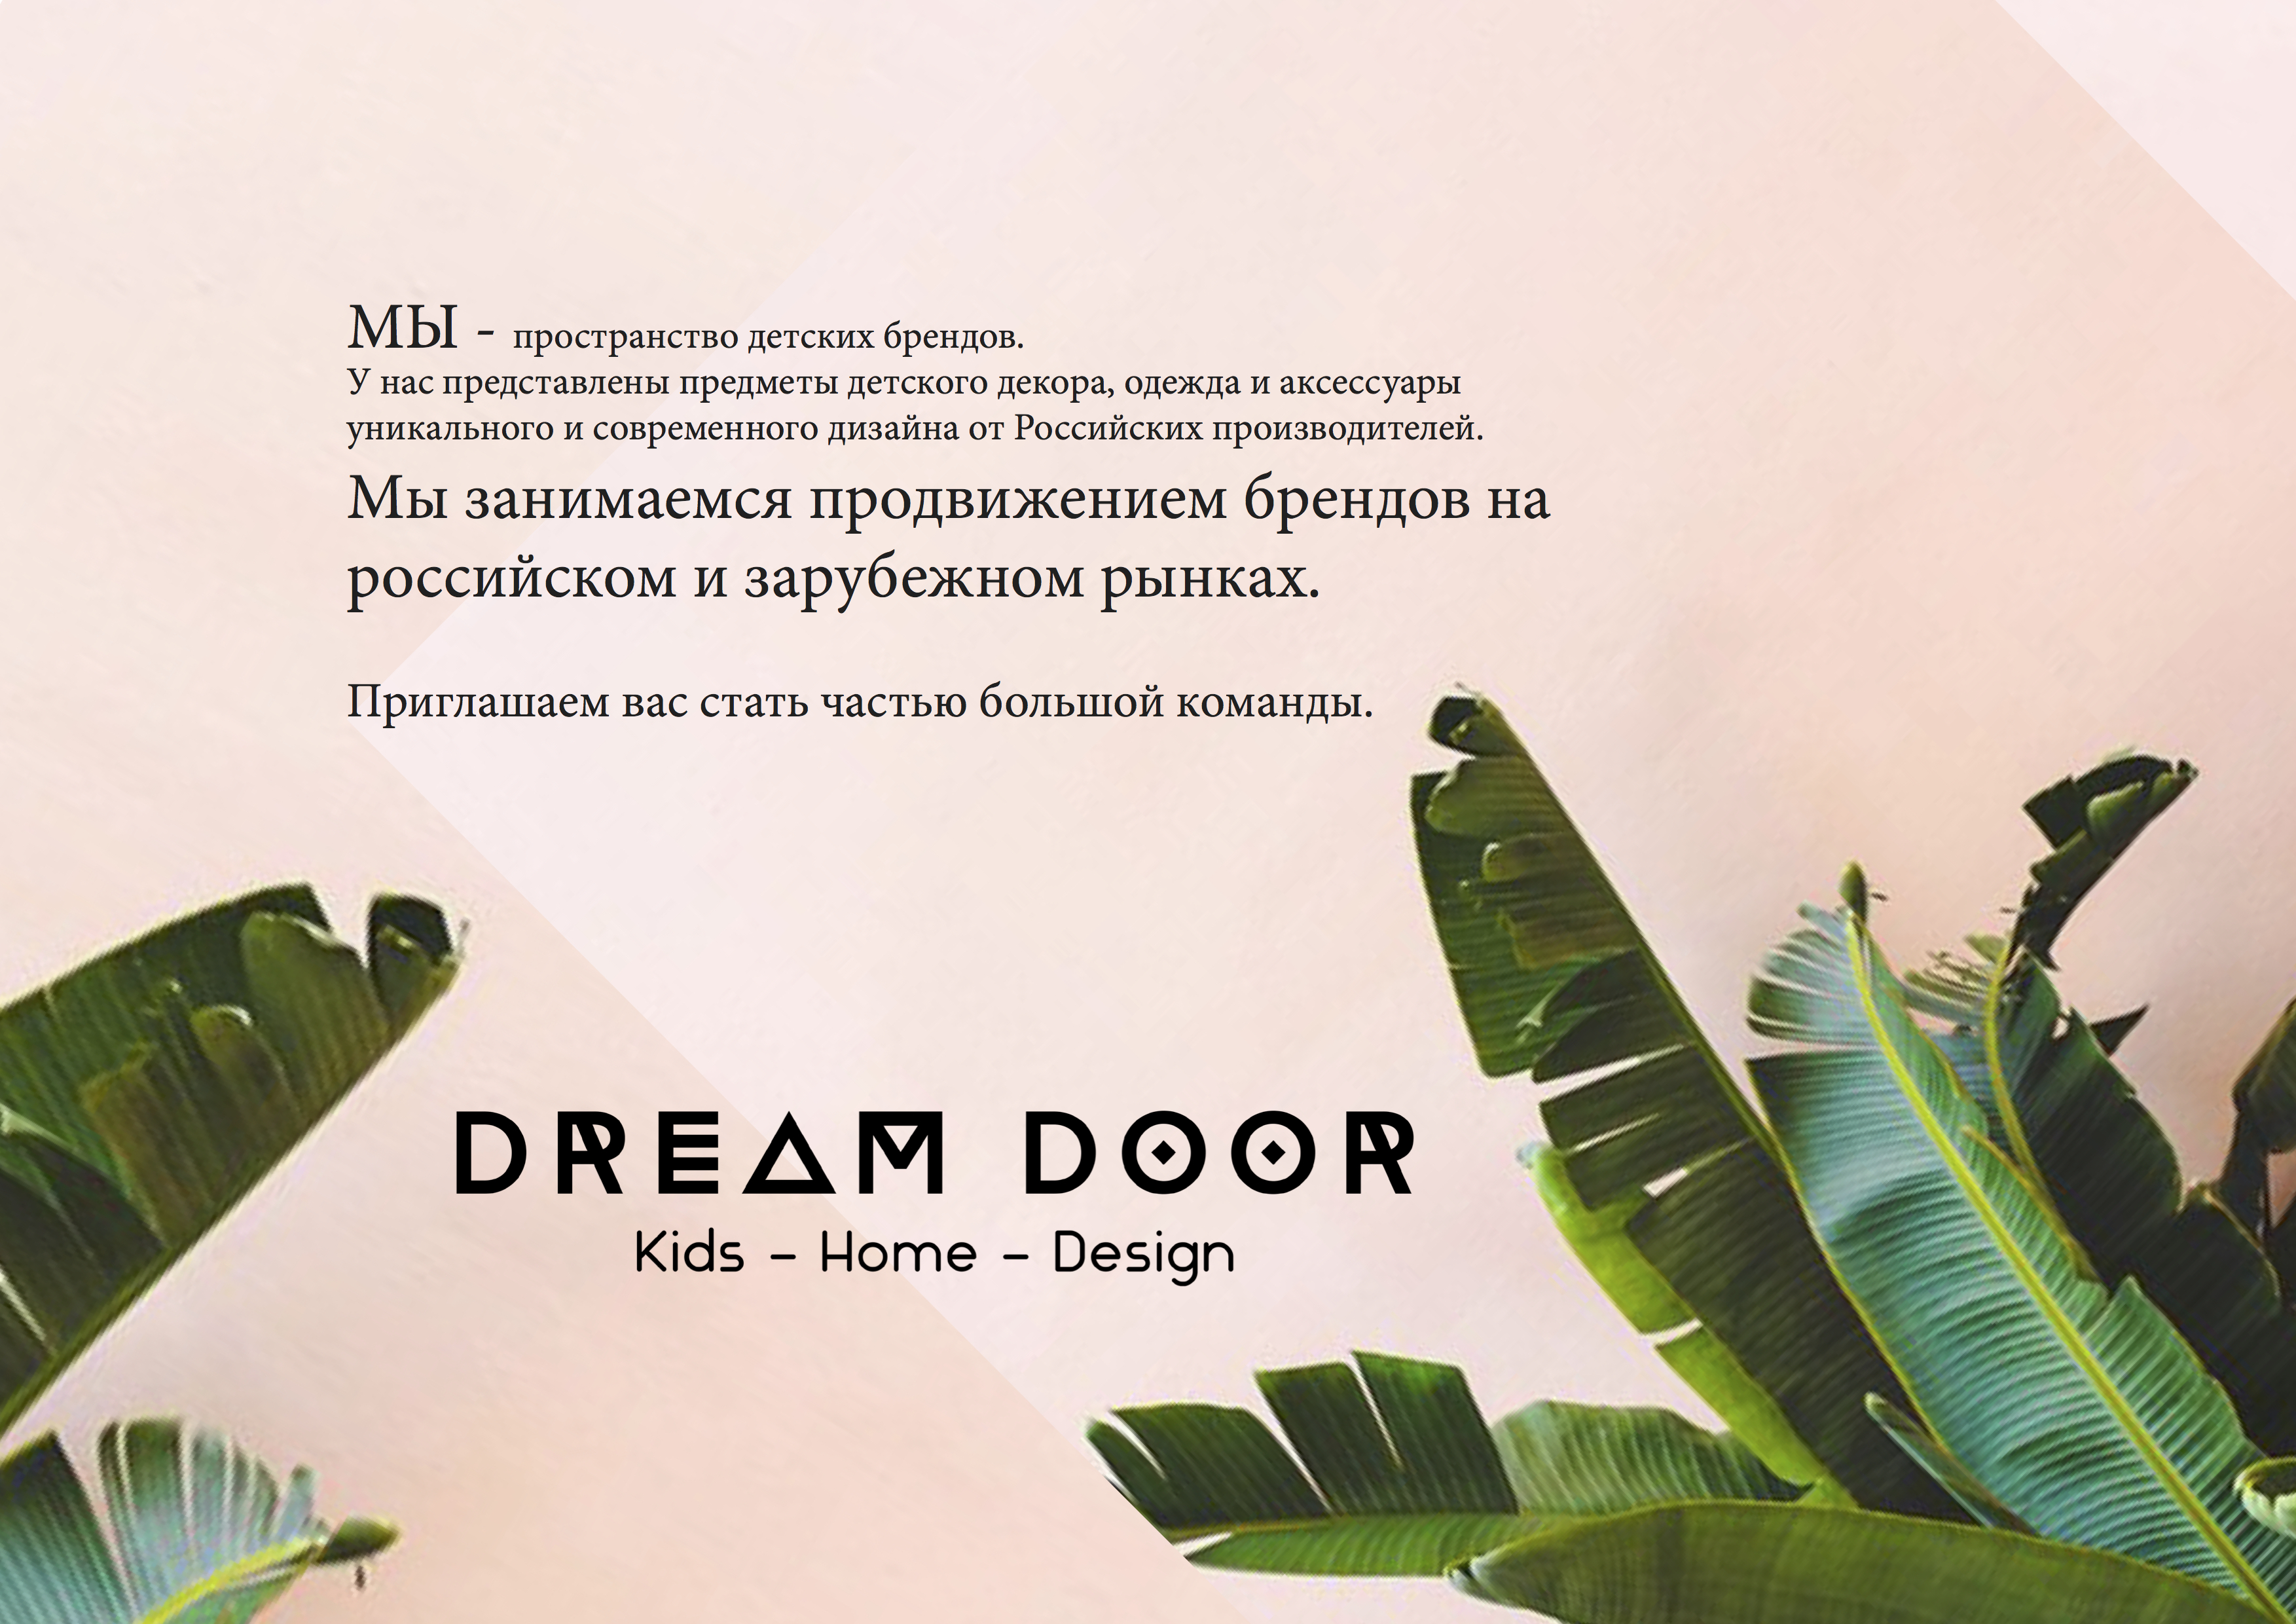 presentationDD.jpg